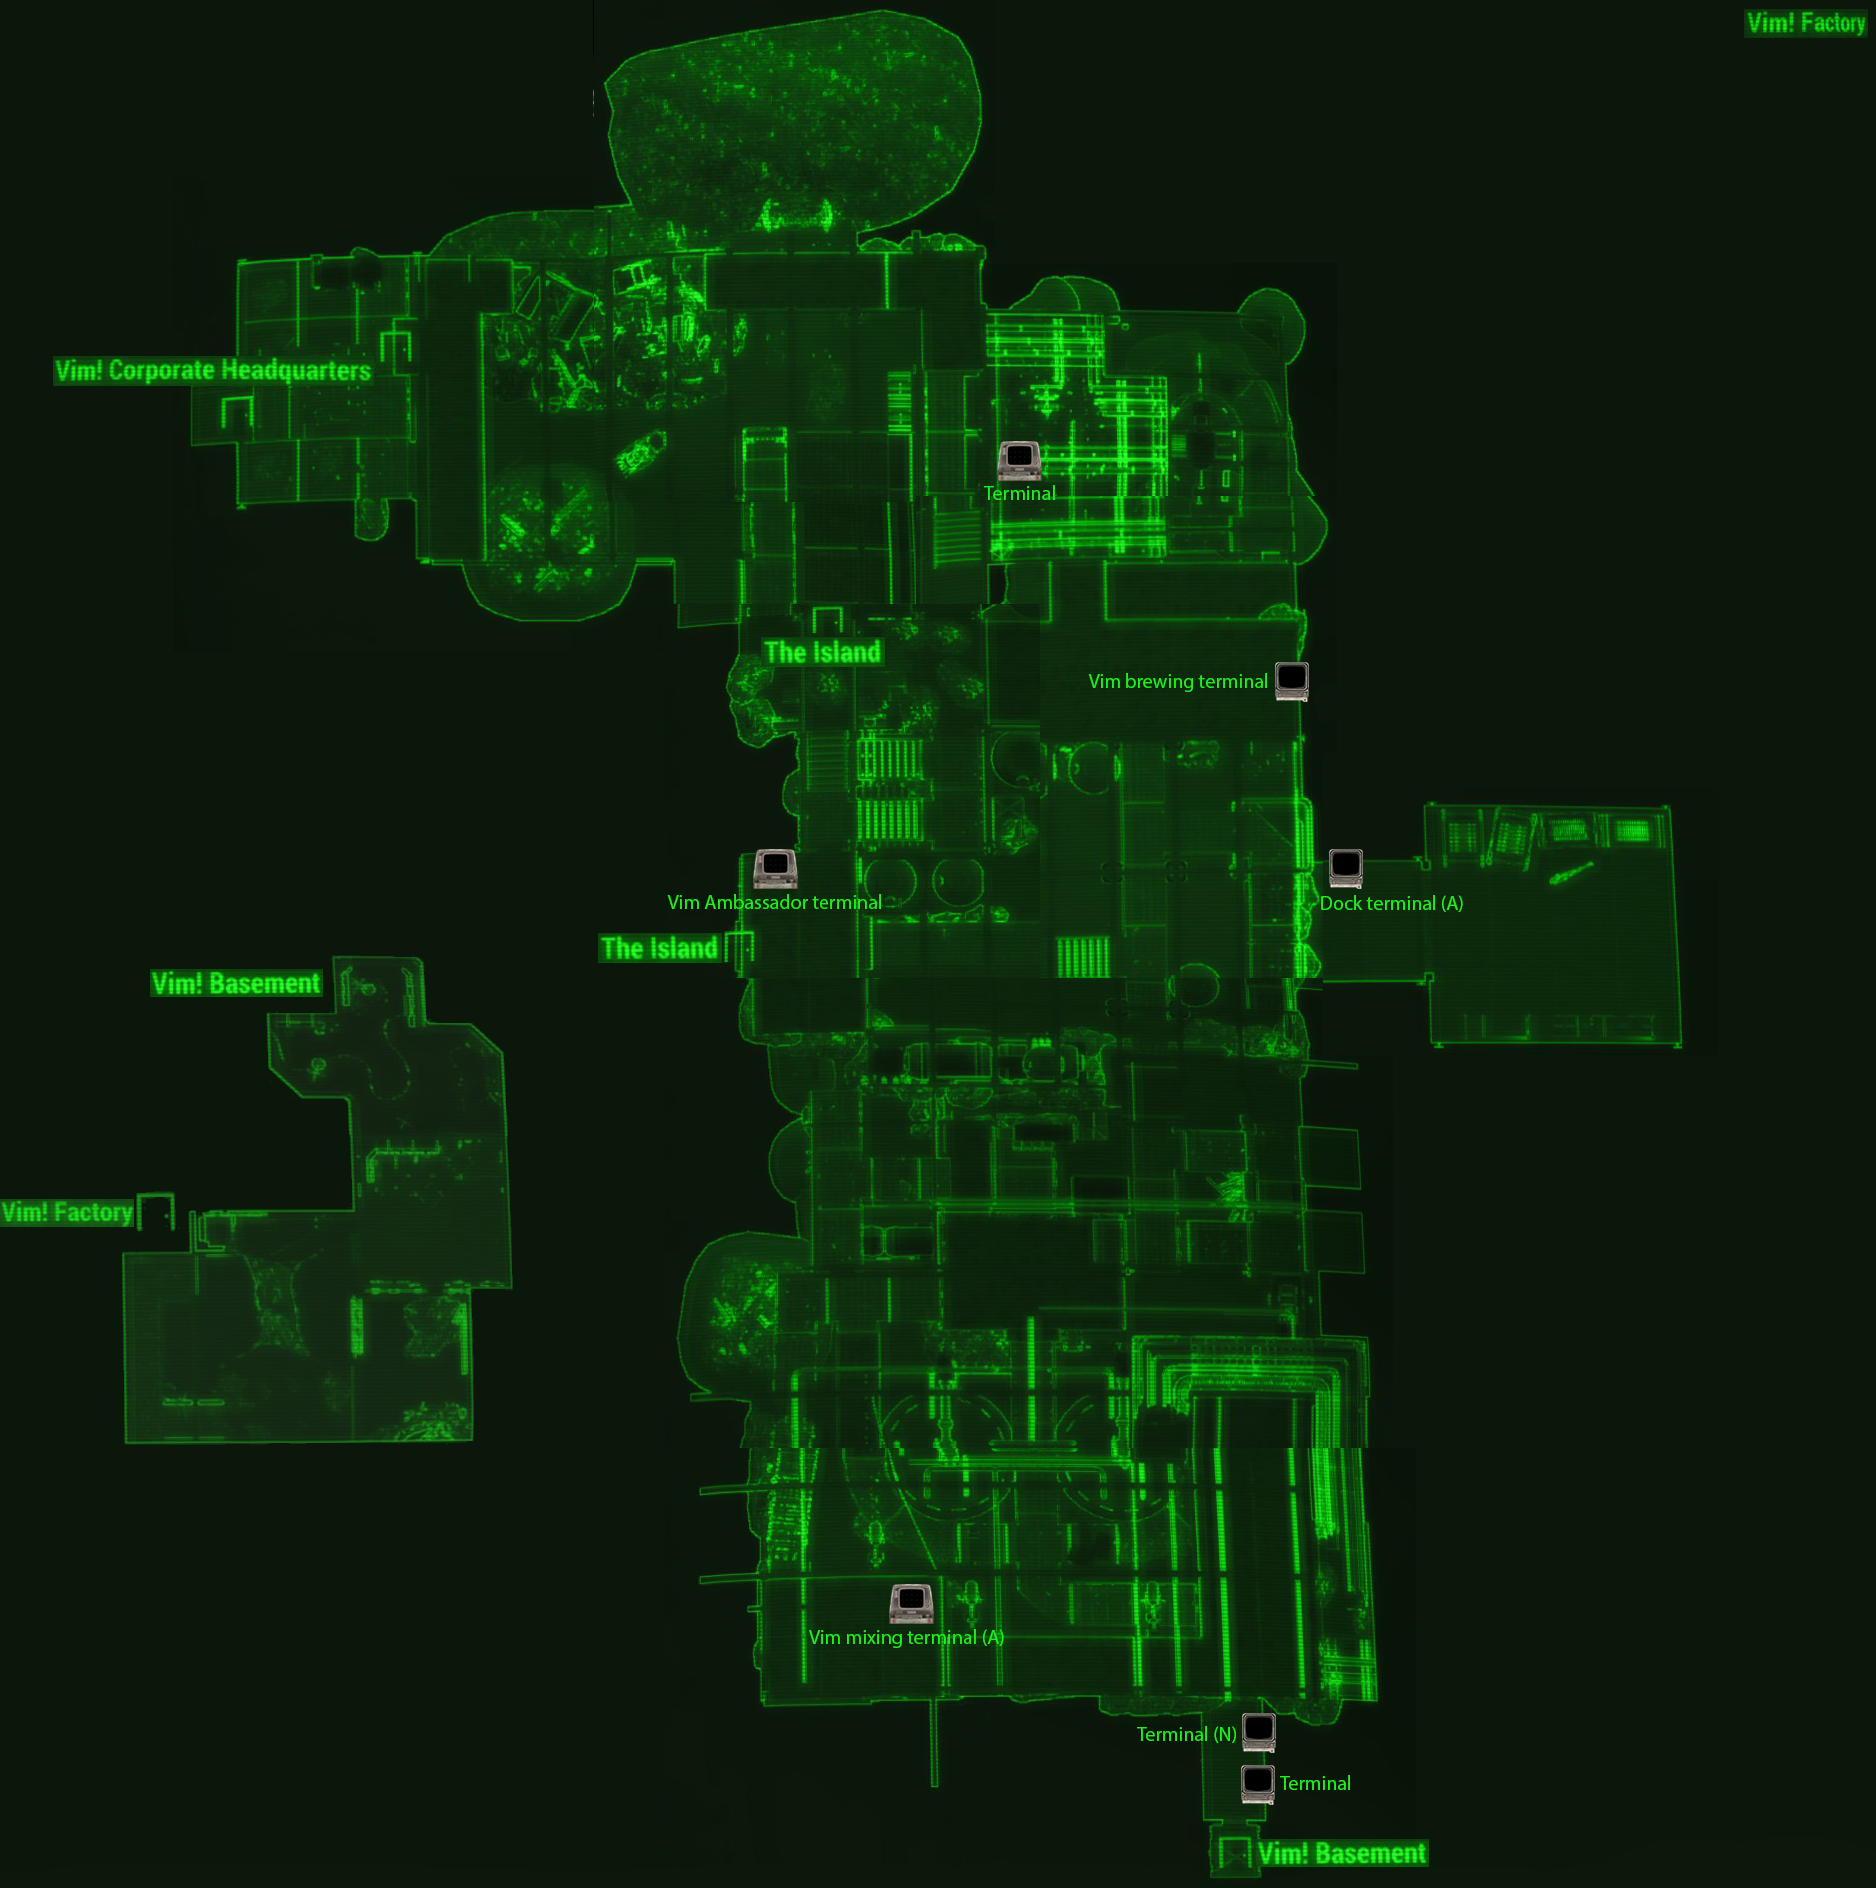 Vim Factory map